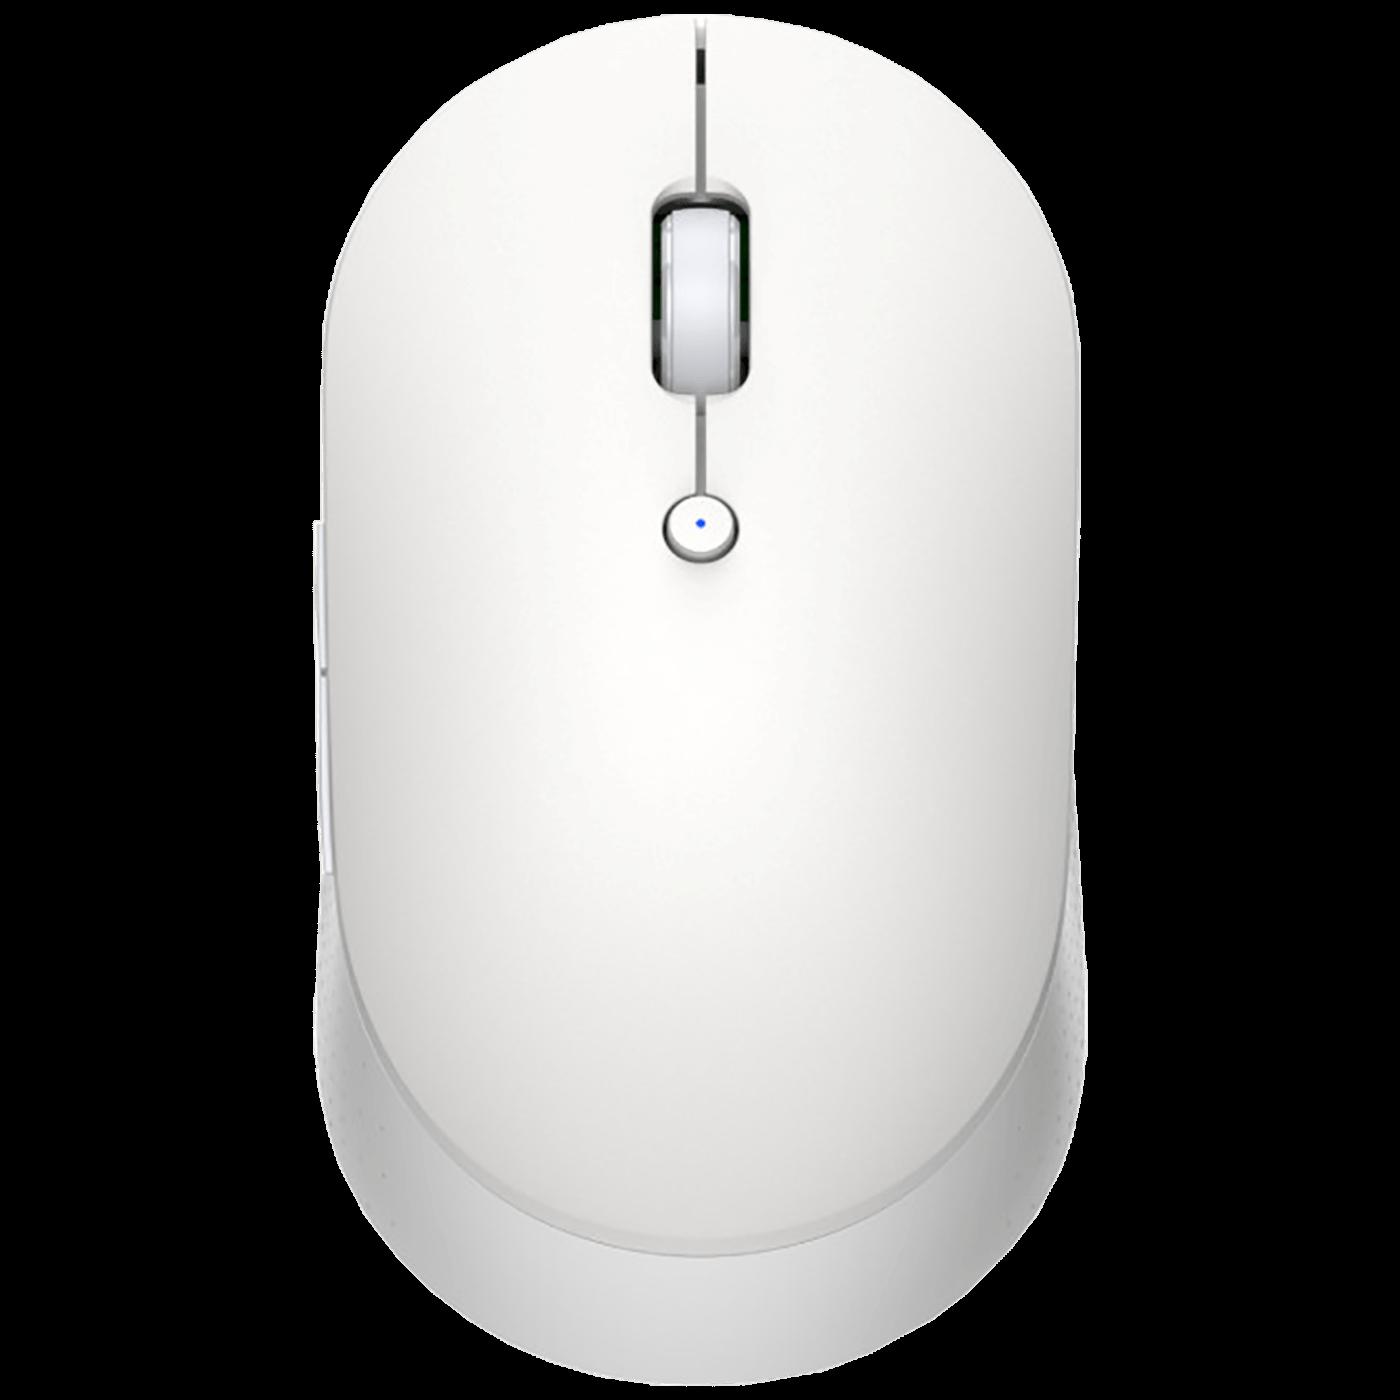 Miš bežični, Dual Bluetooth / 2.4 GHz, laser, 1300 dpi